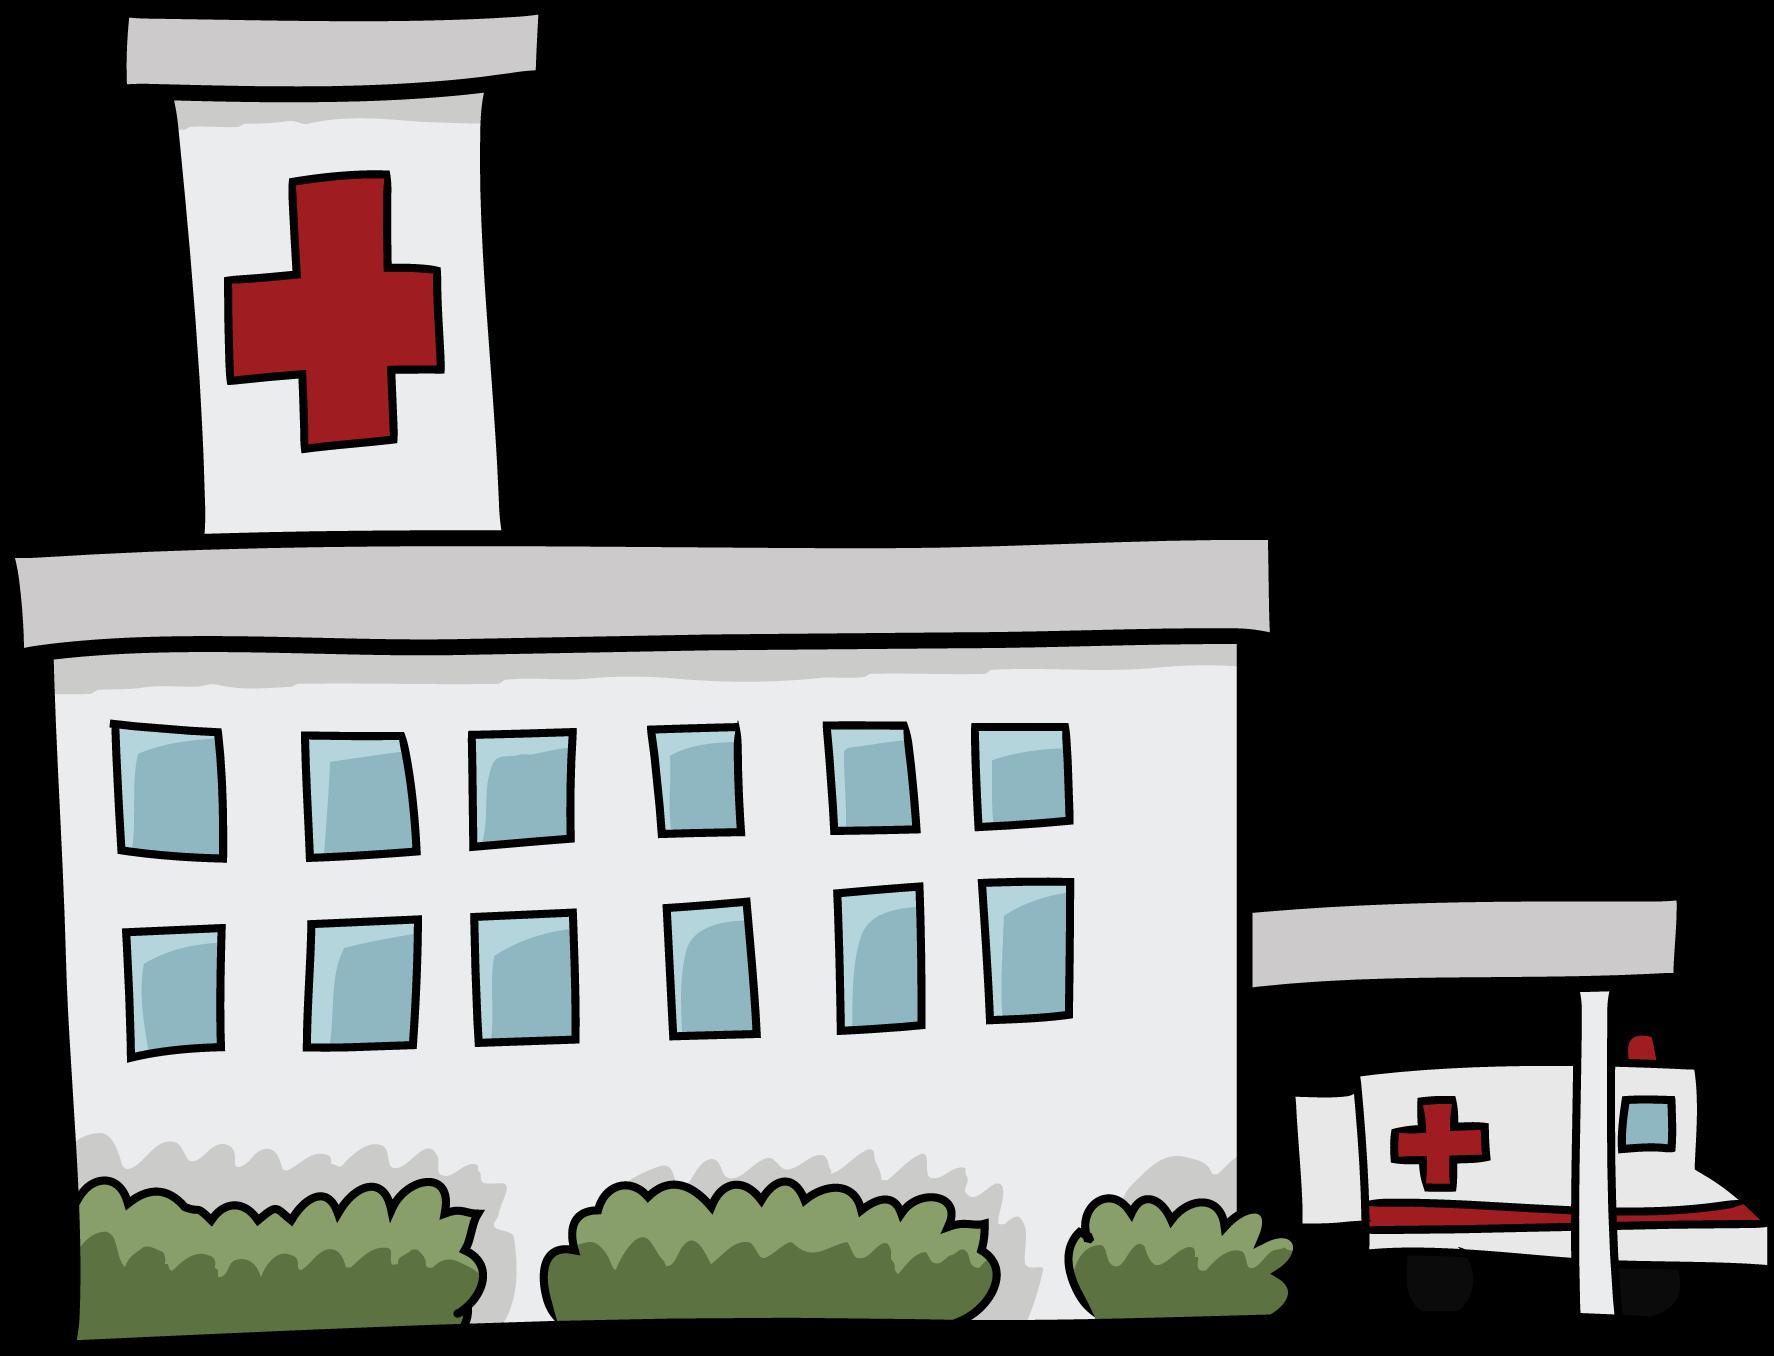 webpage clipart u0026middot; hospital clipart